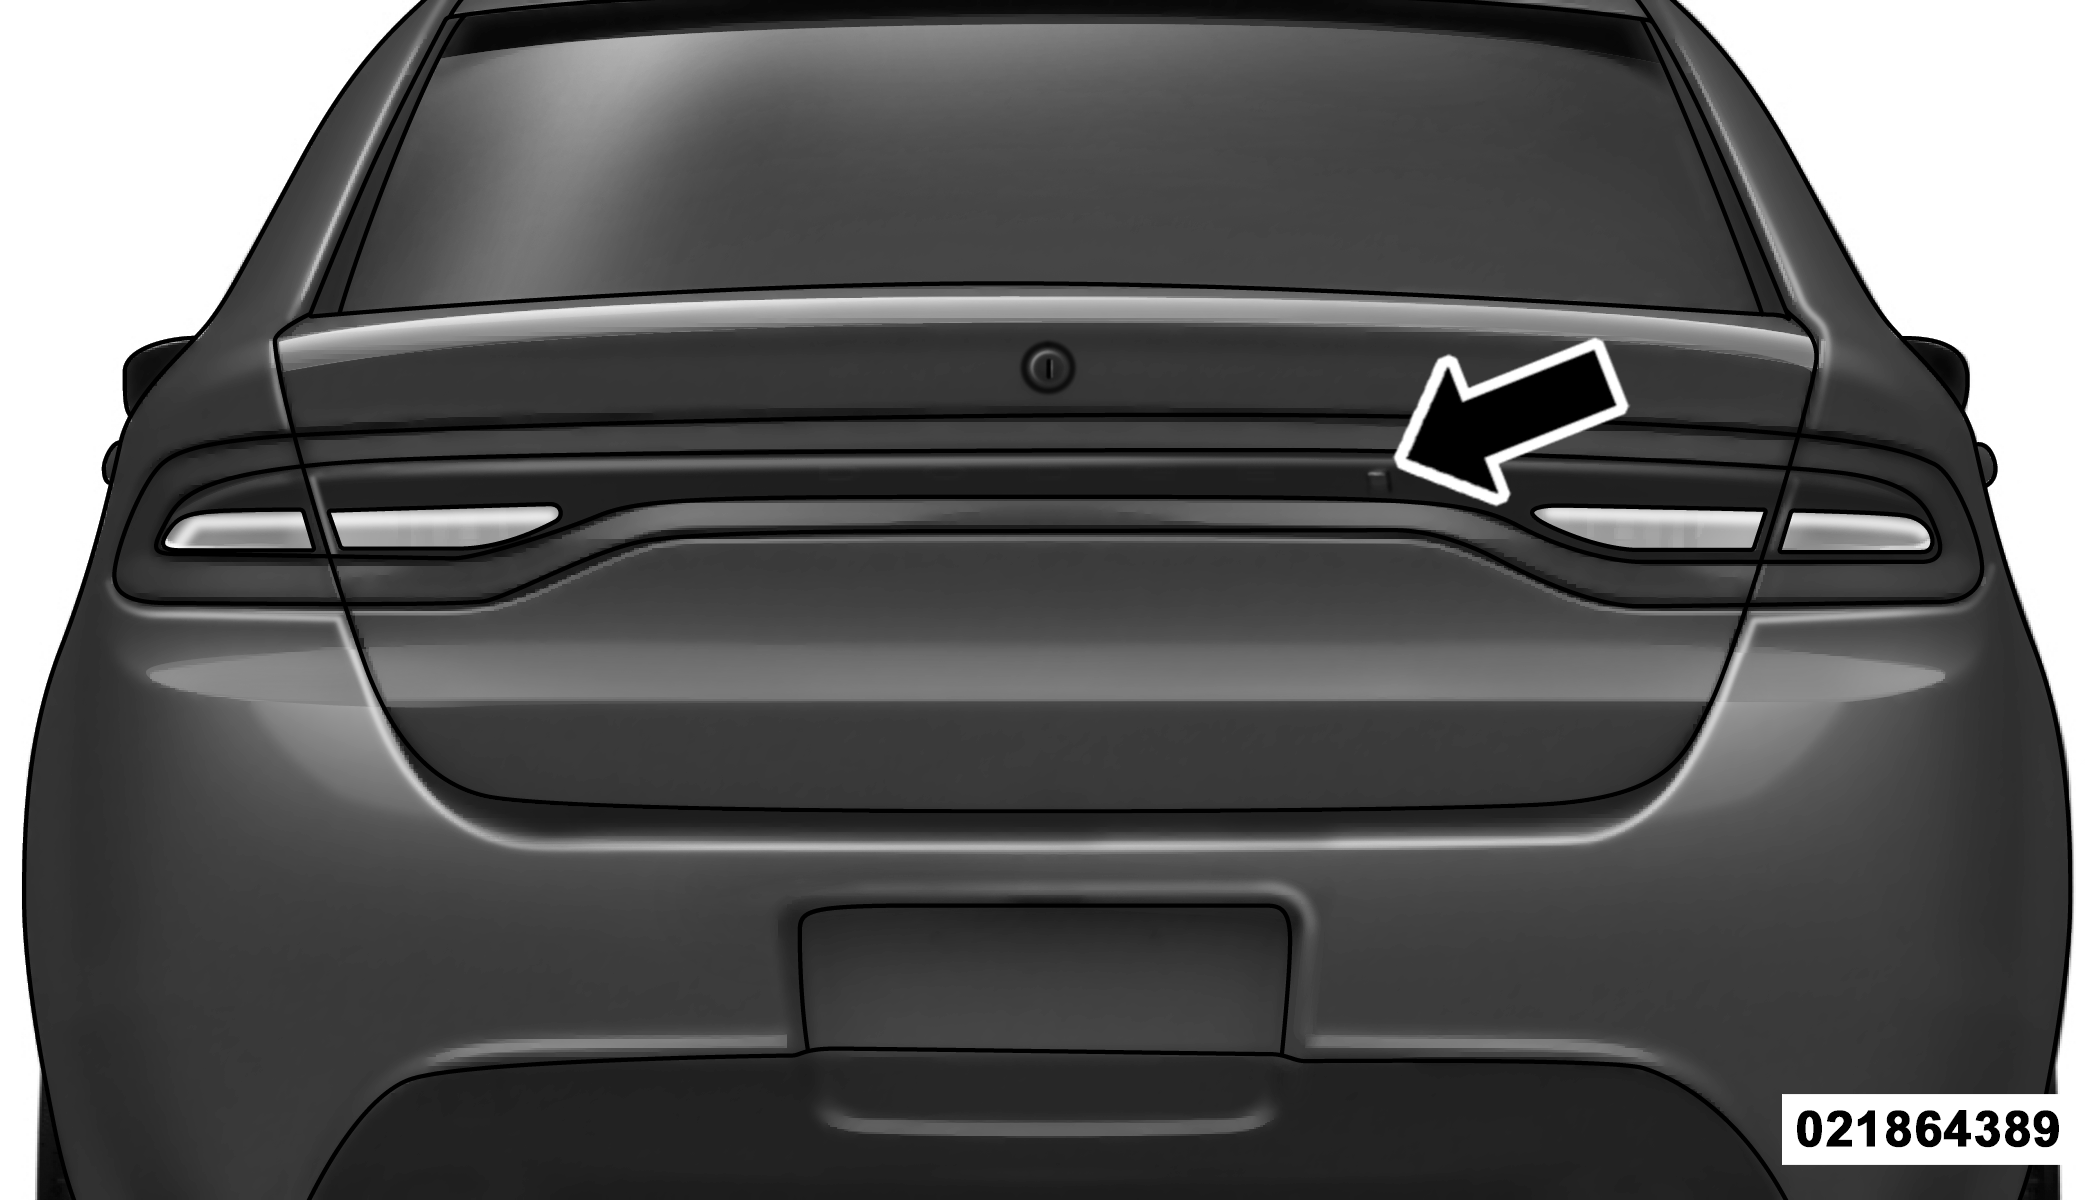 Chrysler 200: Remote Key Unlock, Driver DoorAll Doors FirstPress